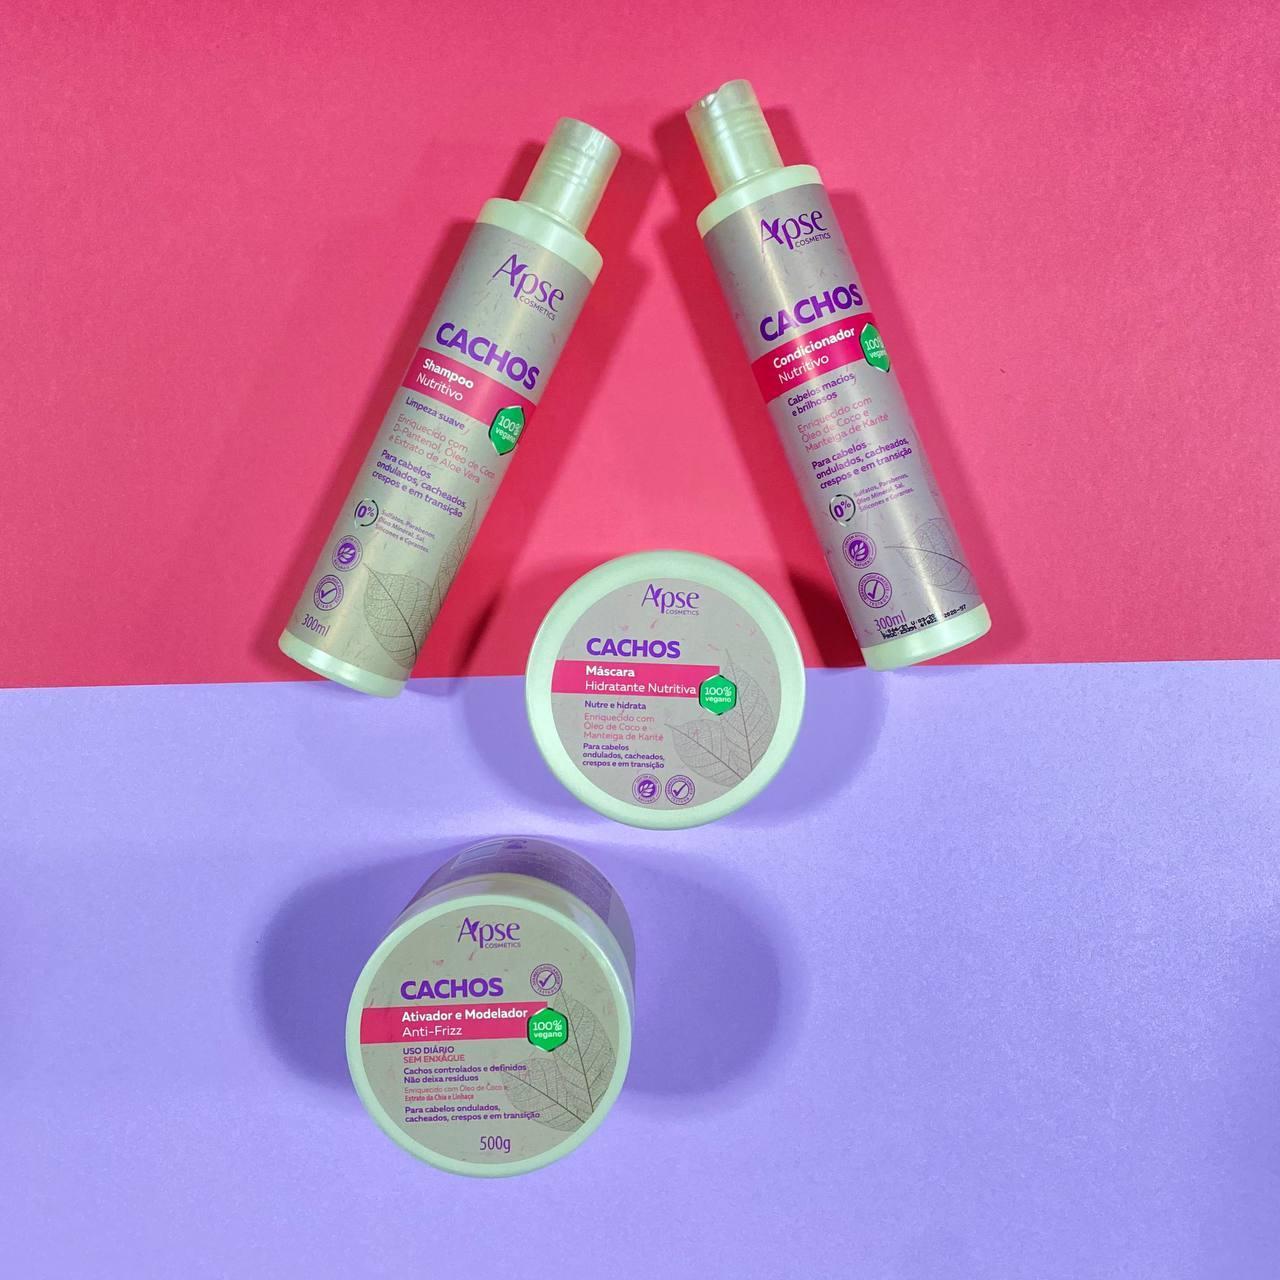 Kit Cachos (4 ITENS) - Apse Cosmetics